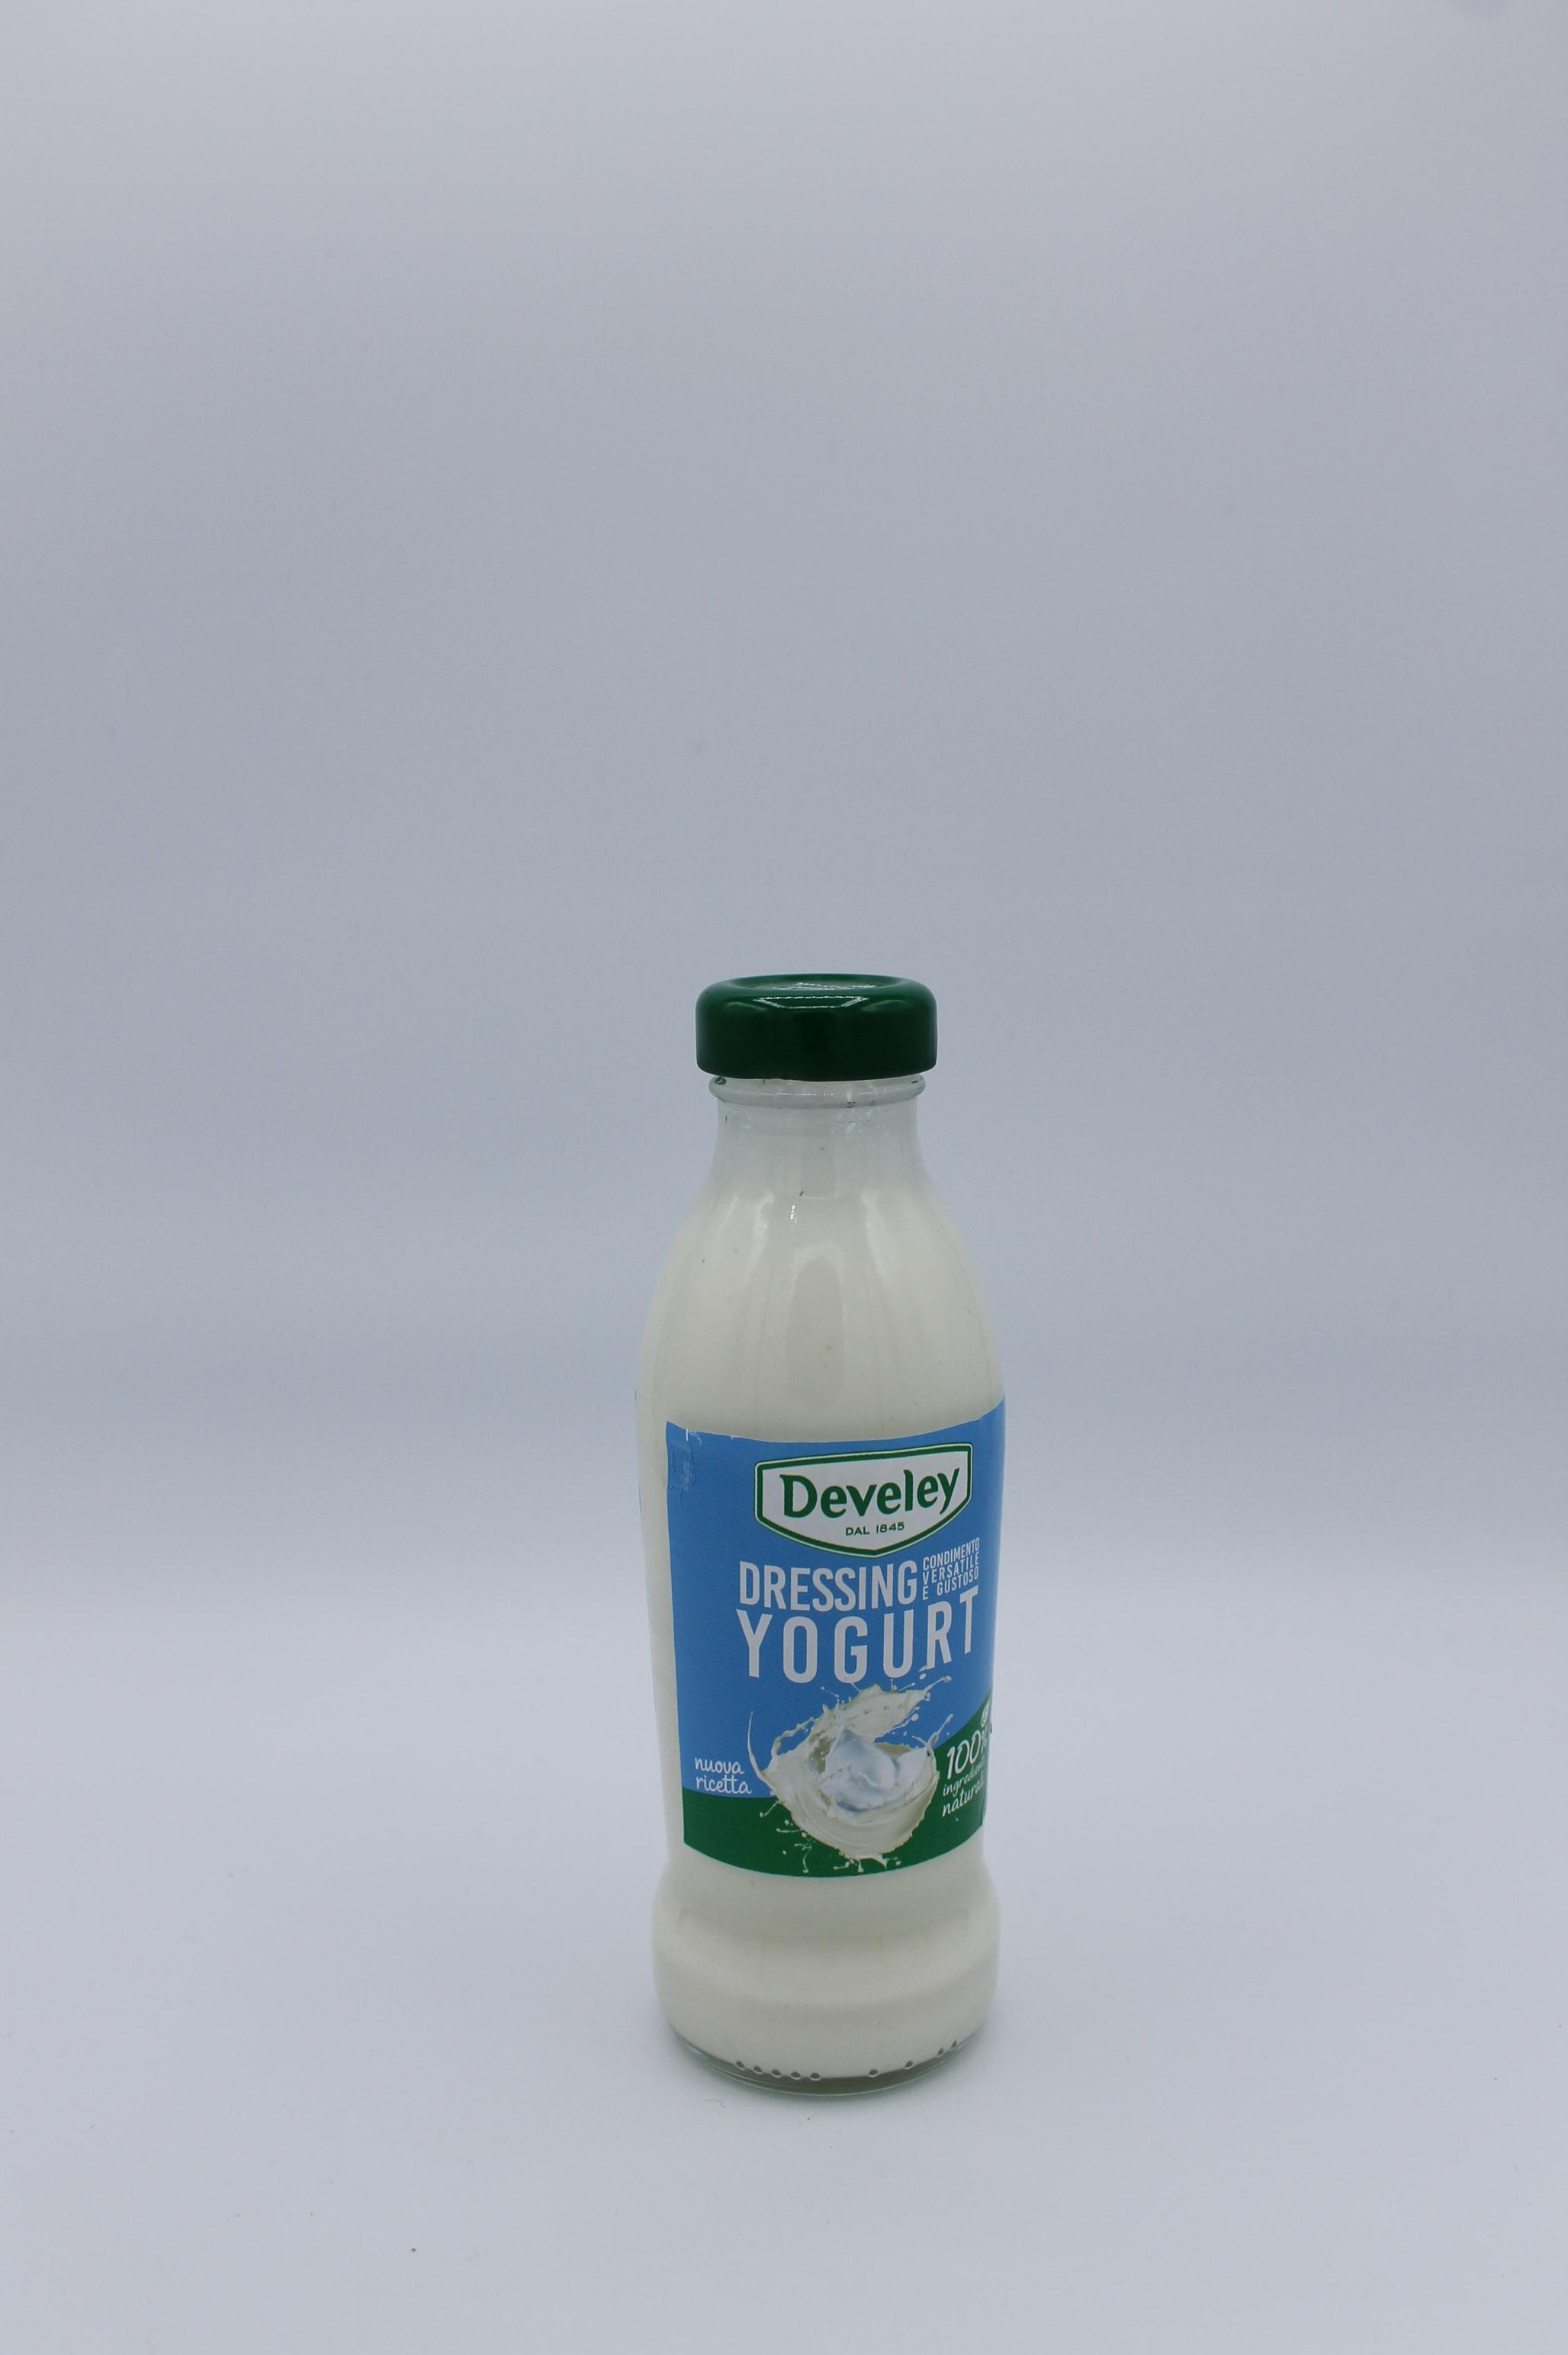 Develey dressing yogurt 238 gr.